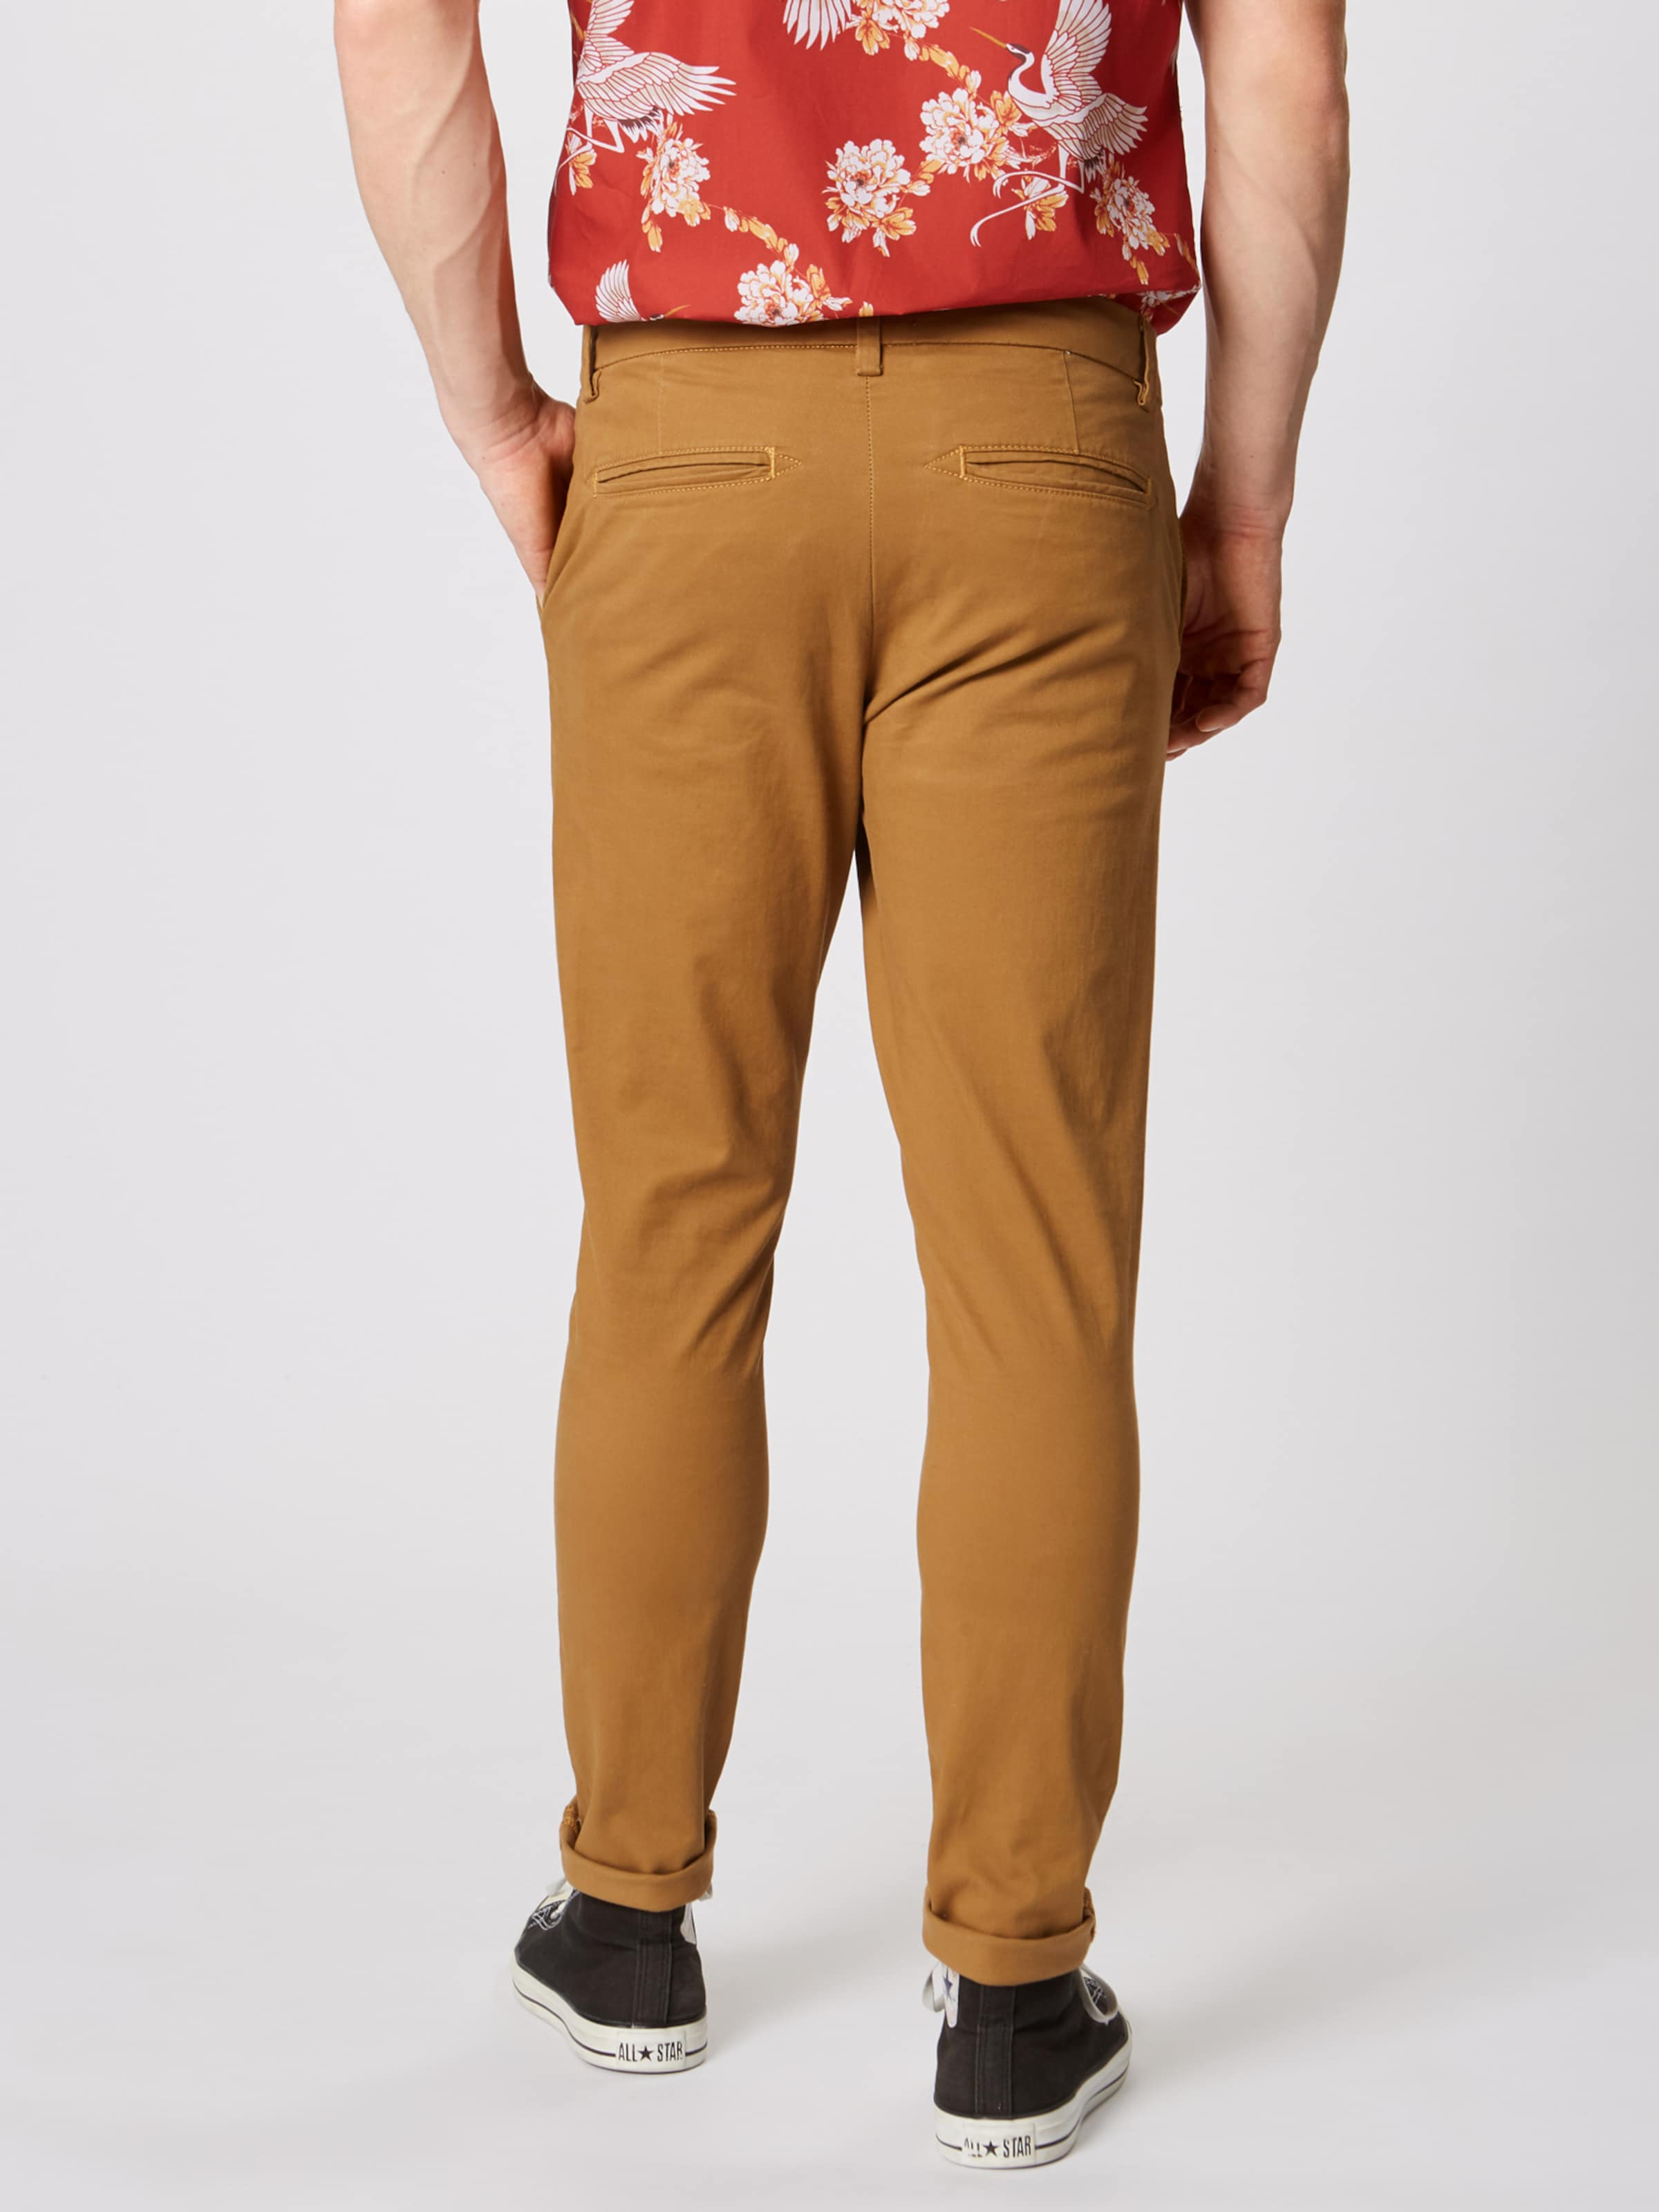 Look Bronze New Chino Pantalon En dCorxBe